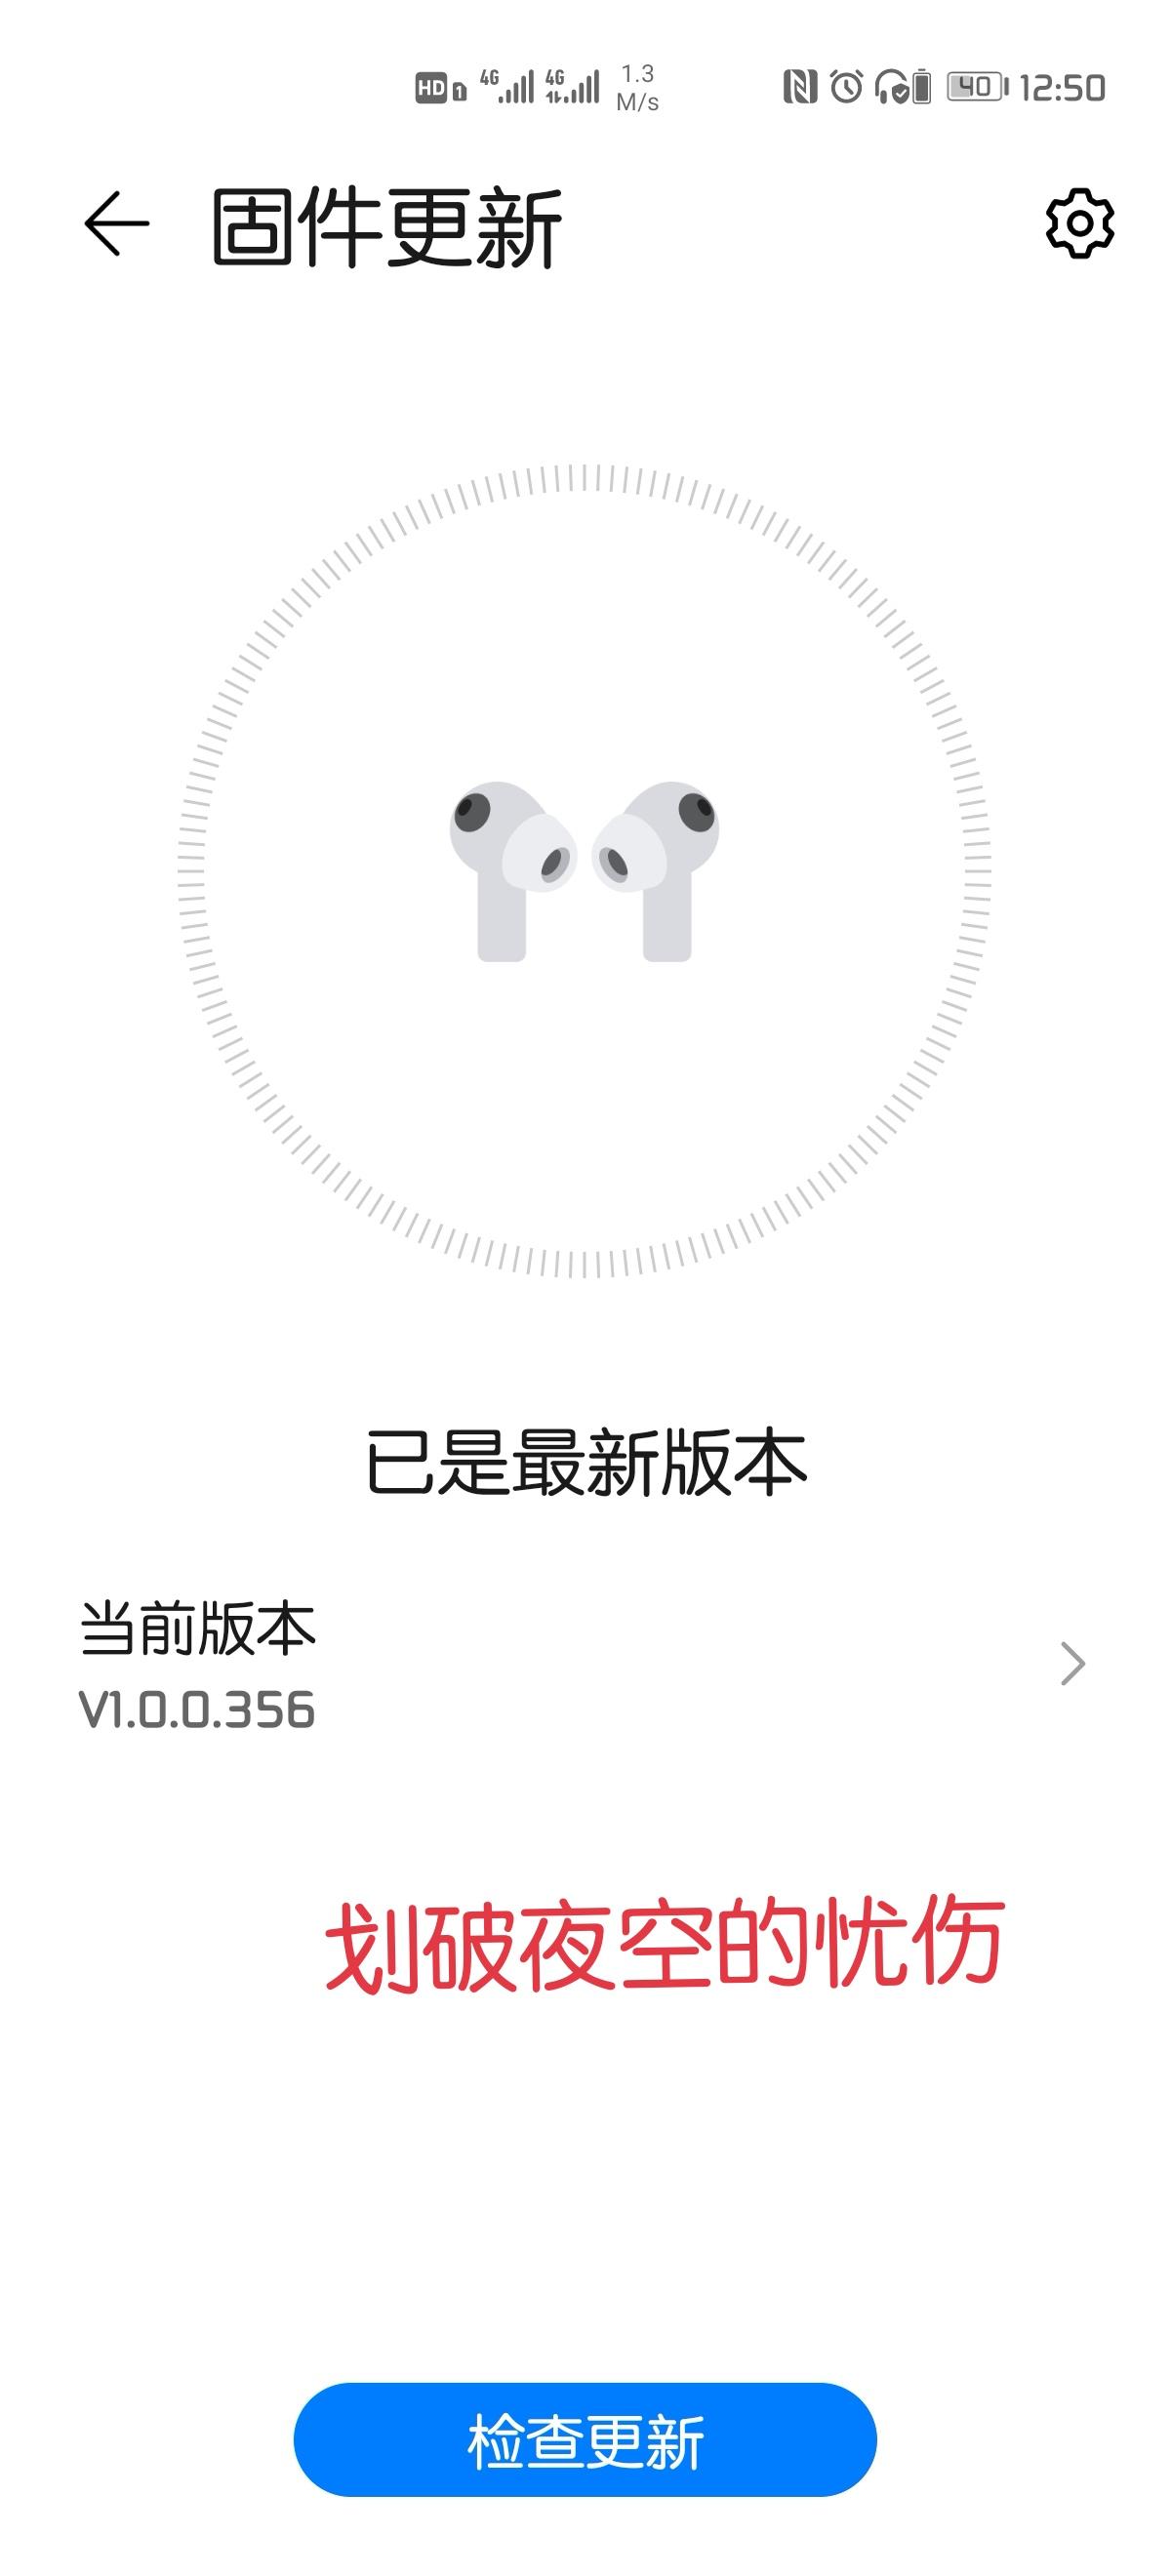 Screenshot_20210329_125052_com.huawei.smarthome_edit_405483614190731.jpg